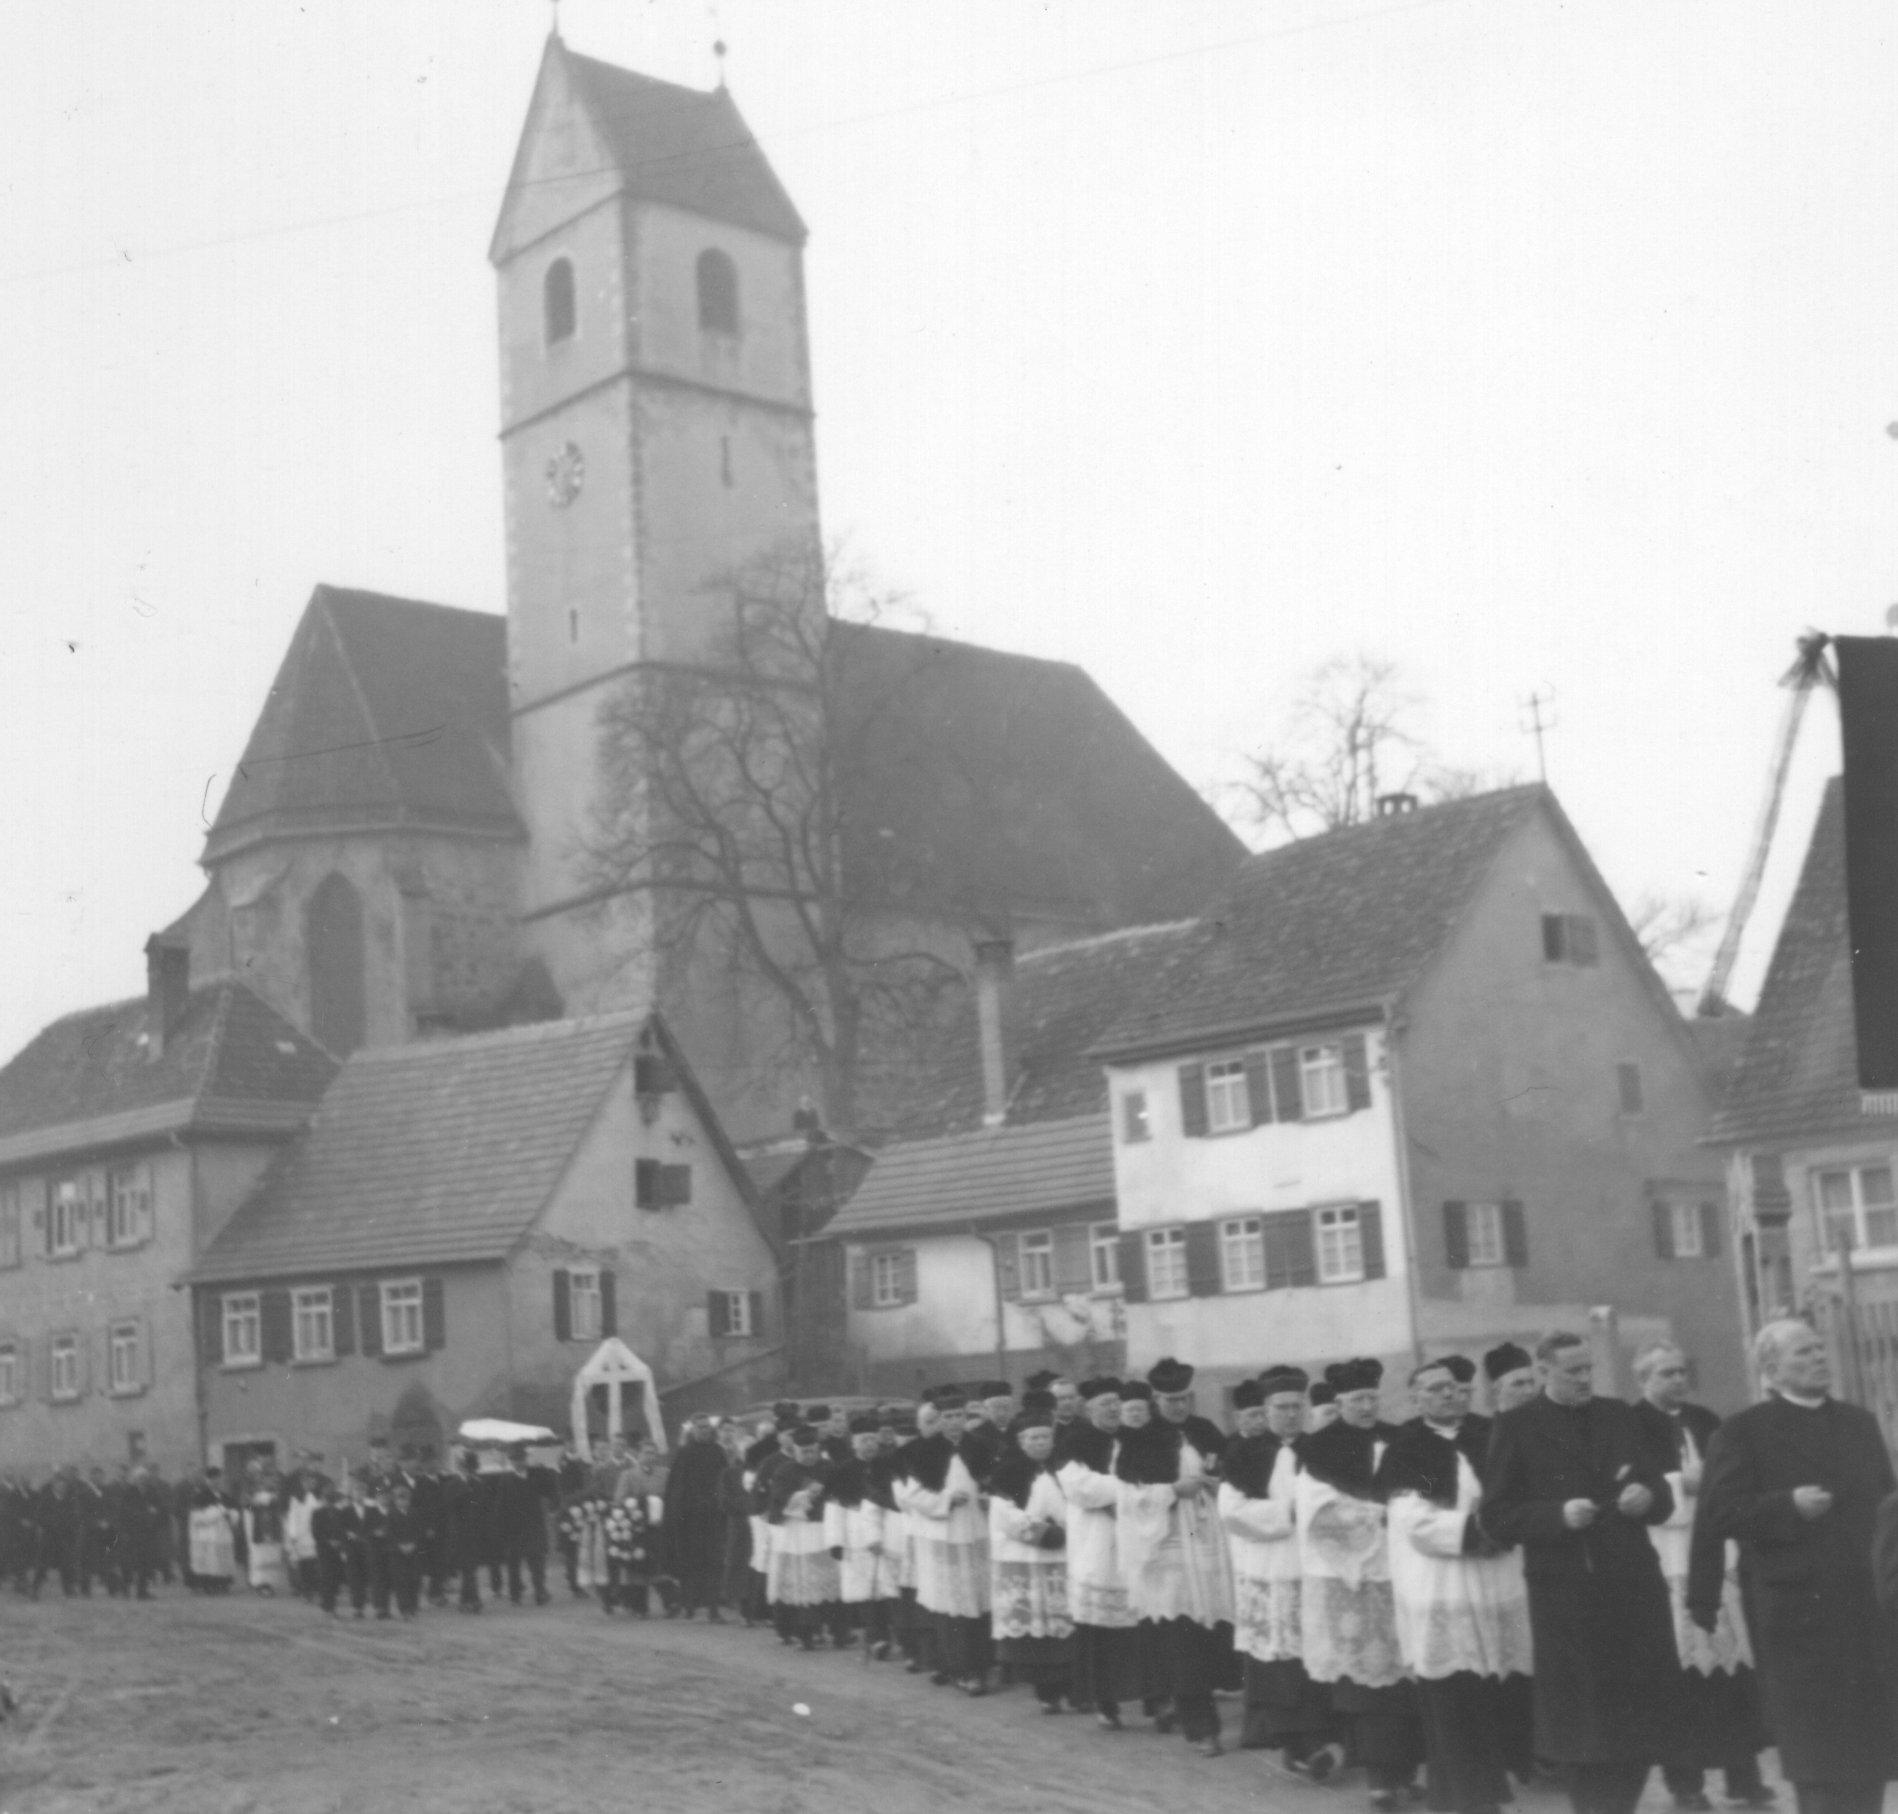 Beerdigungszug02